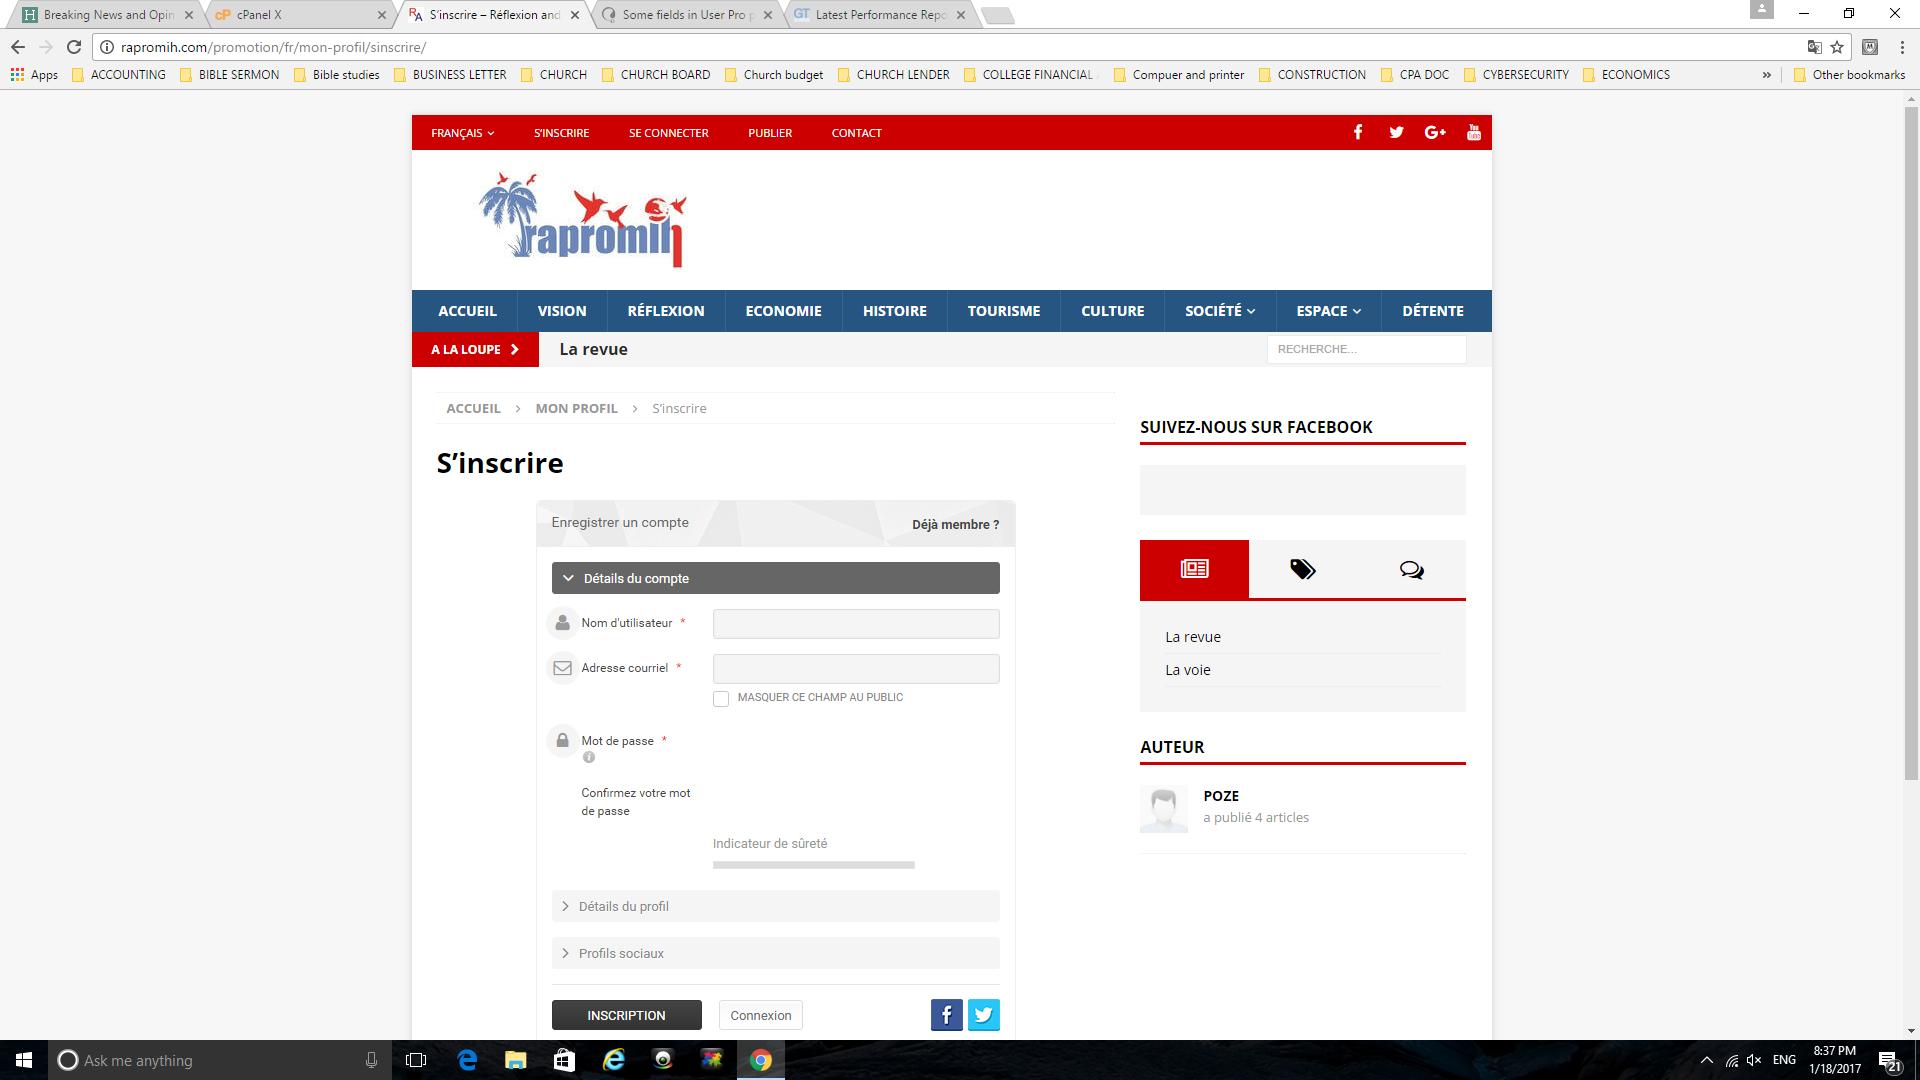 Screenshot french.png